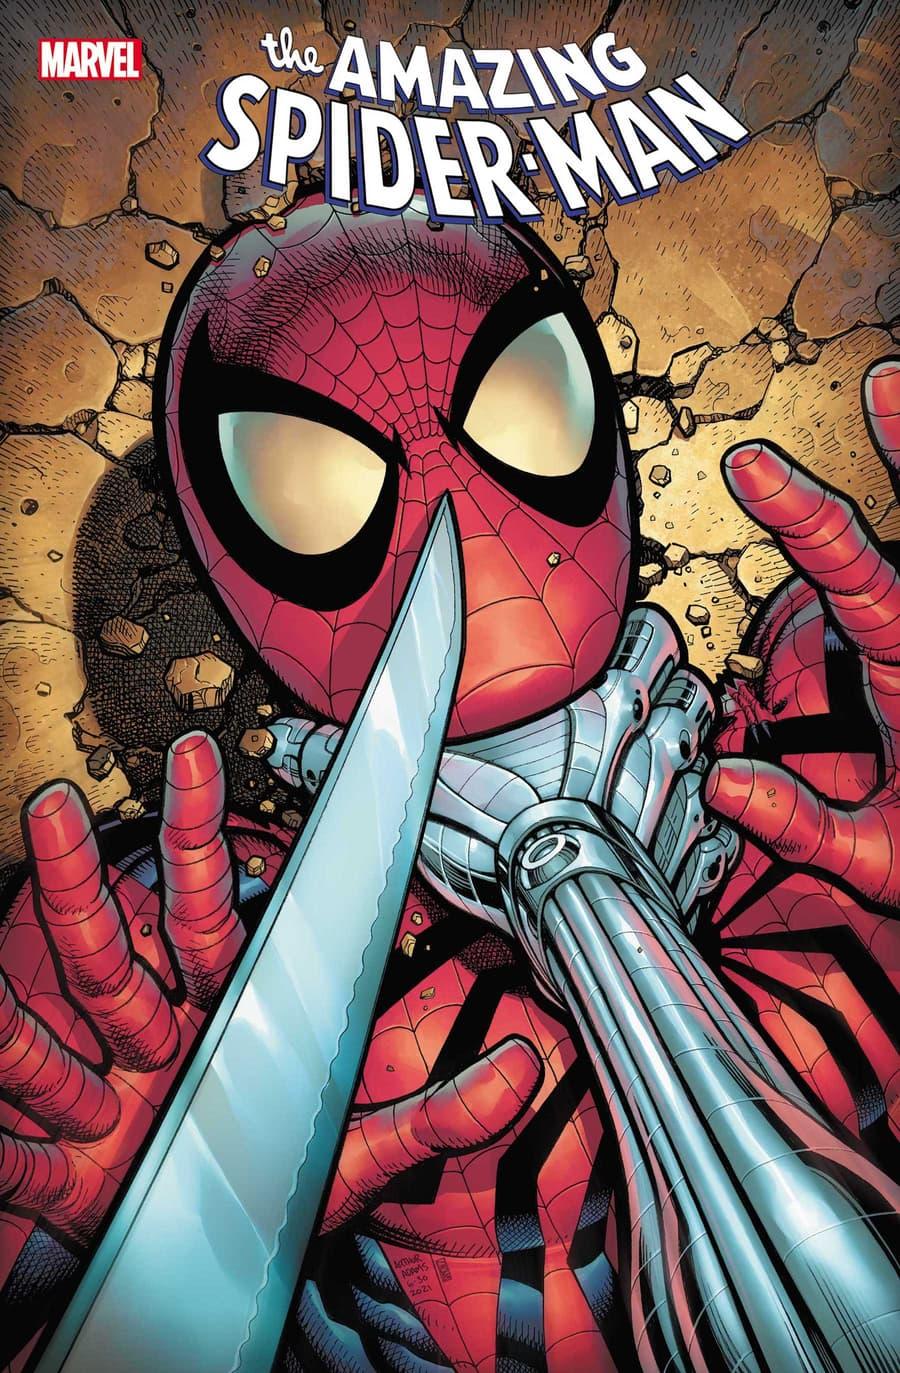 AMAZING SPIDER-MAN #77 cover by Arthur Adams